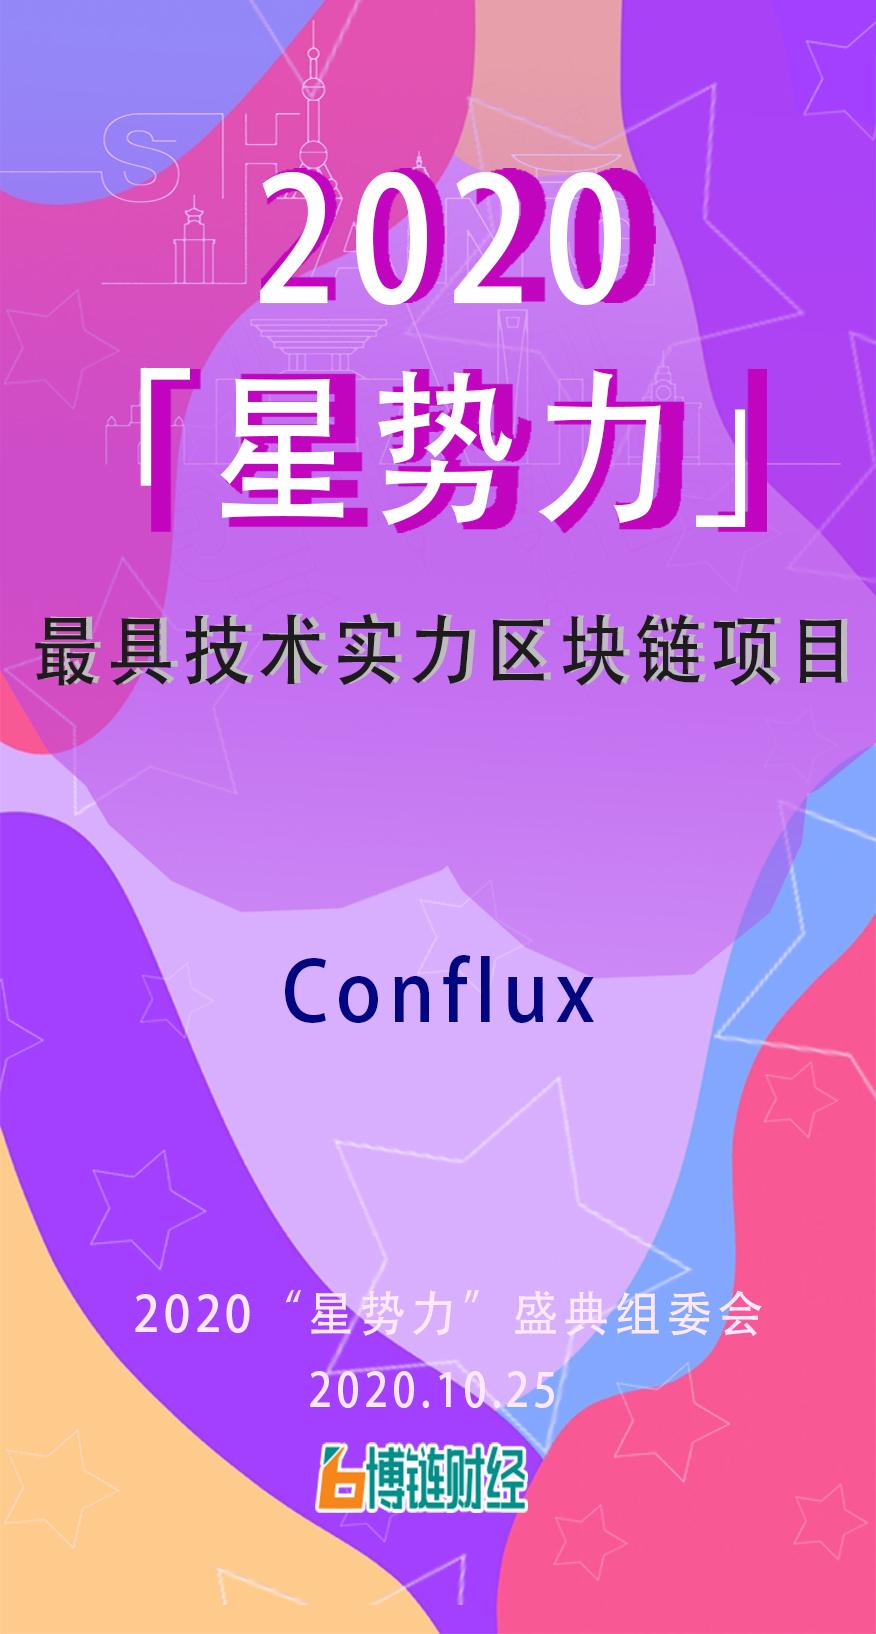 Conflux.jpg